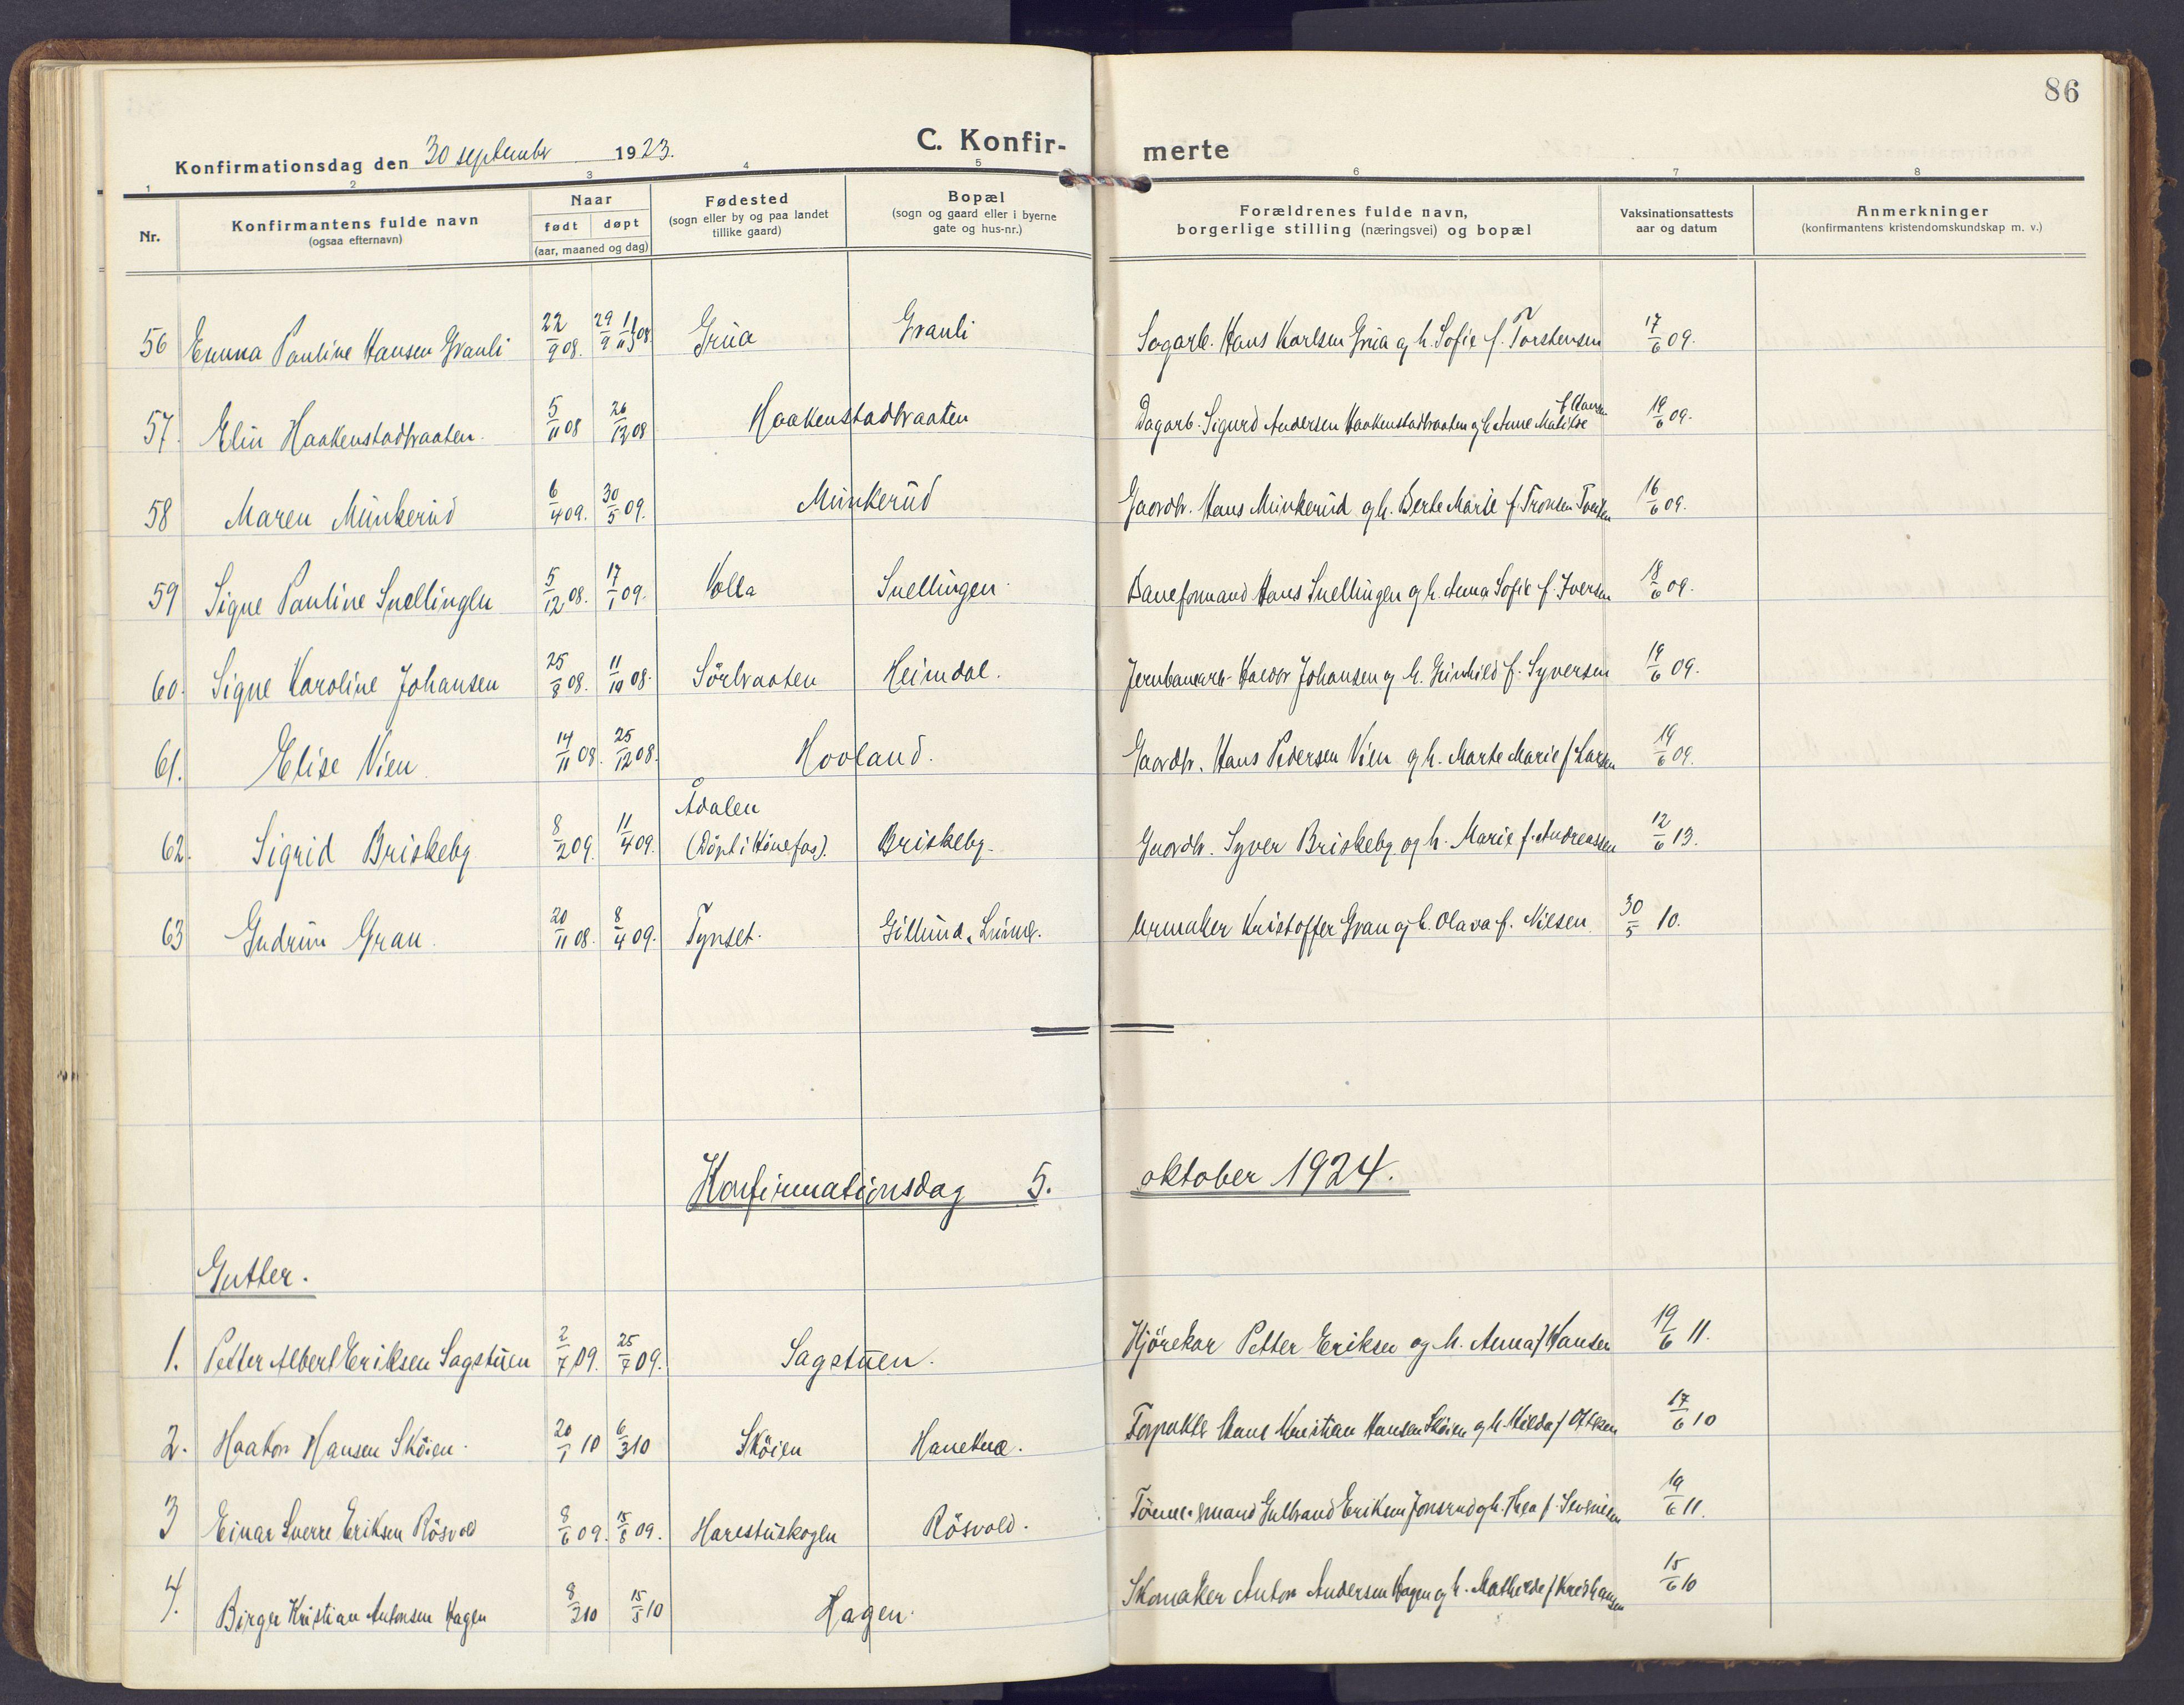 SAH, Lunner prestekontor, H/Ha/Haa/L0002: Ministerialbok nr. 2, 1922-1931, s. 86